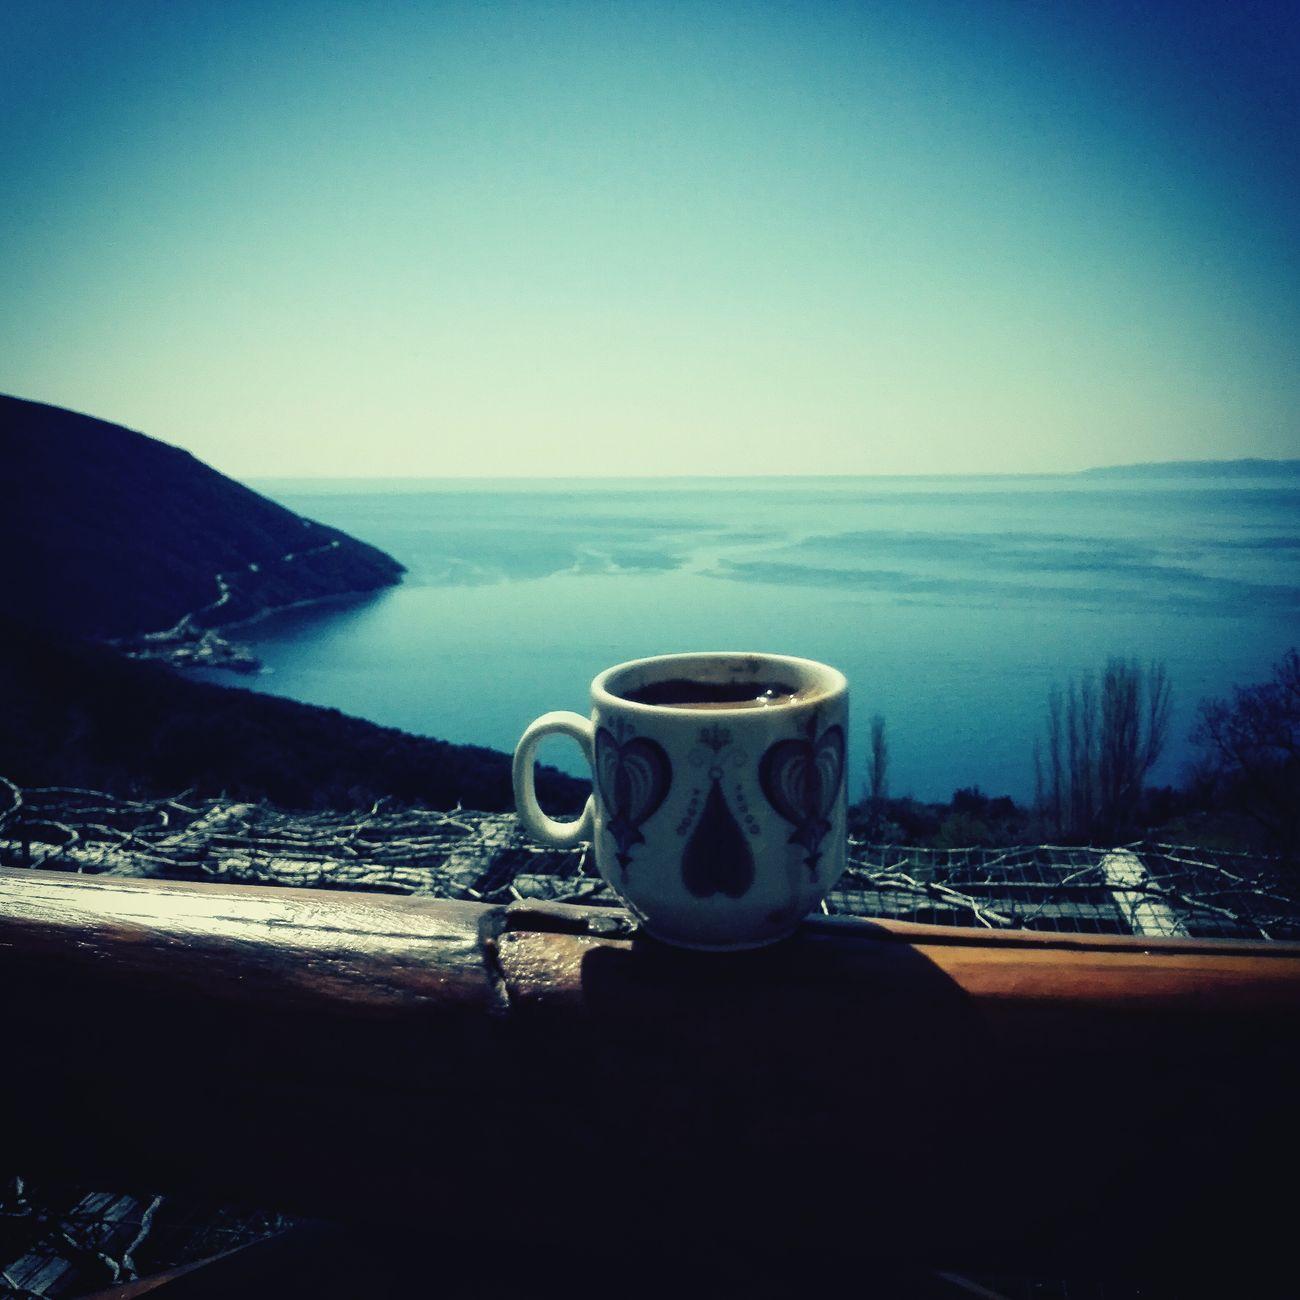 Greek Coffee  Enjoying Life Agio Oros Aegean Sea Blue Sky Greece Morning Relaxing Honor6